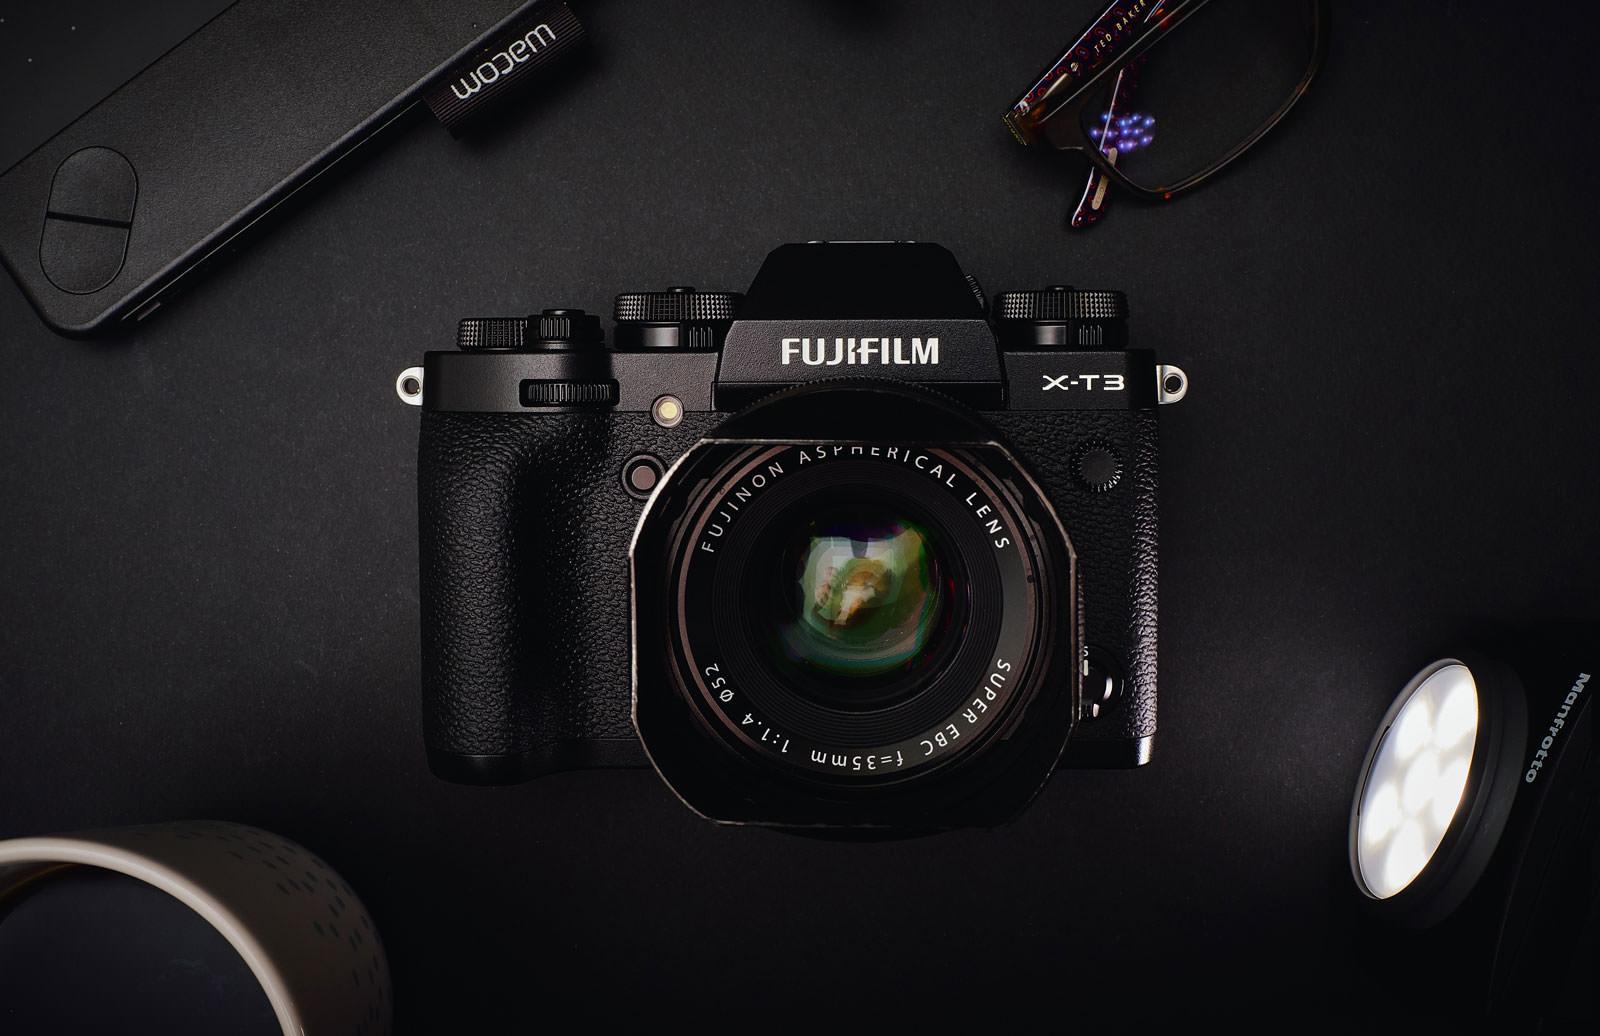 Fujifilm X-T3 – One Week Of WOW – Two Hot Shoes Wedding